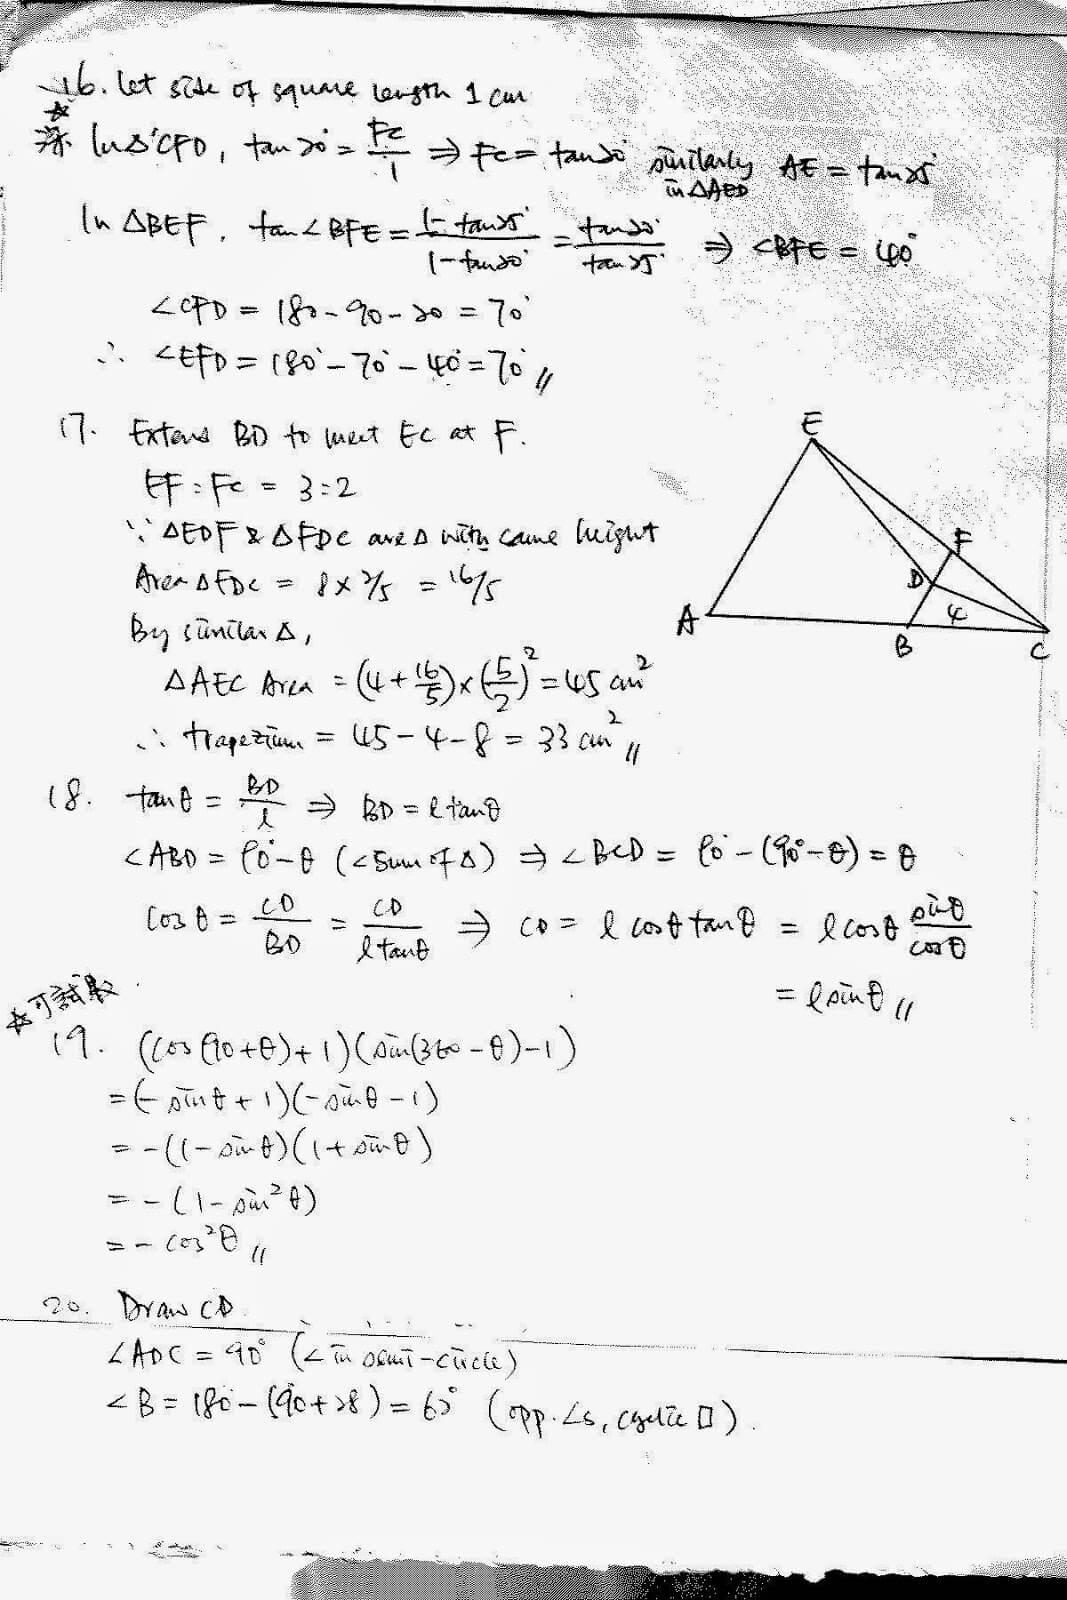 2014 DSE Math 數學 卷二 P2 Q16,17,18,19,20